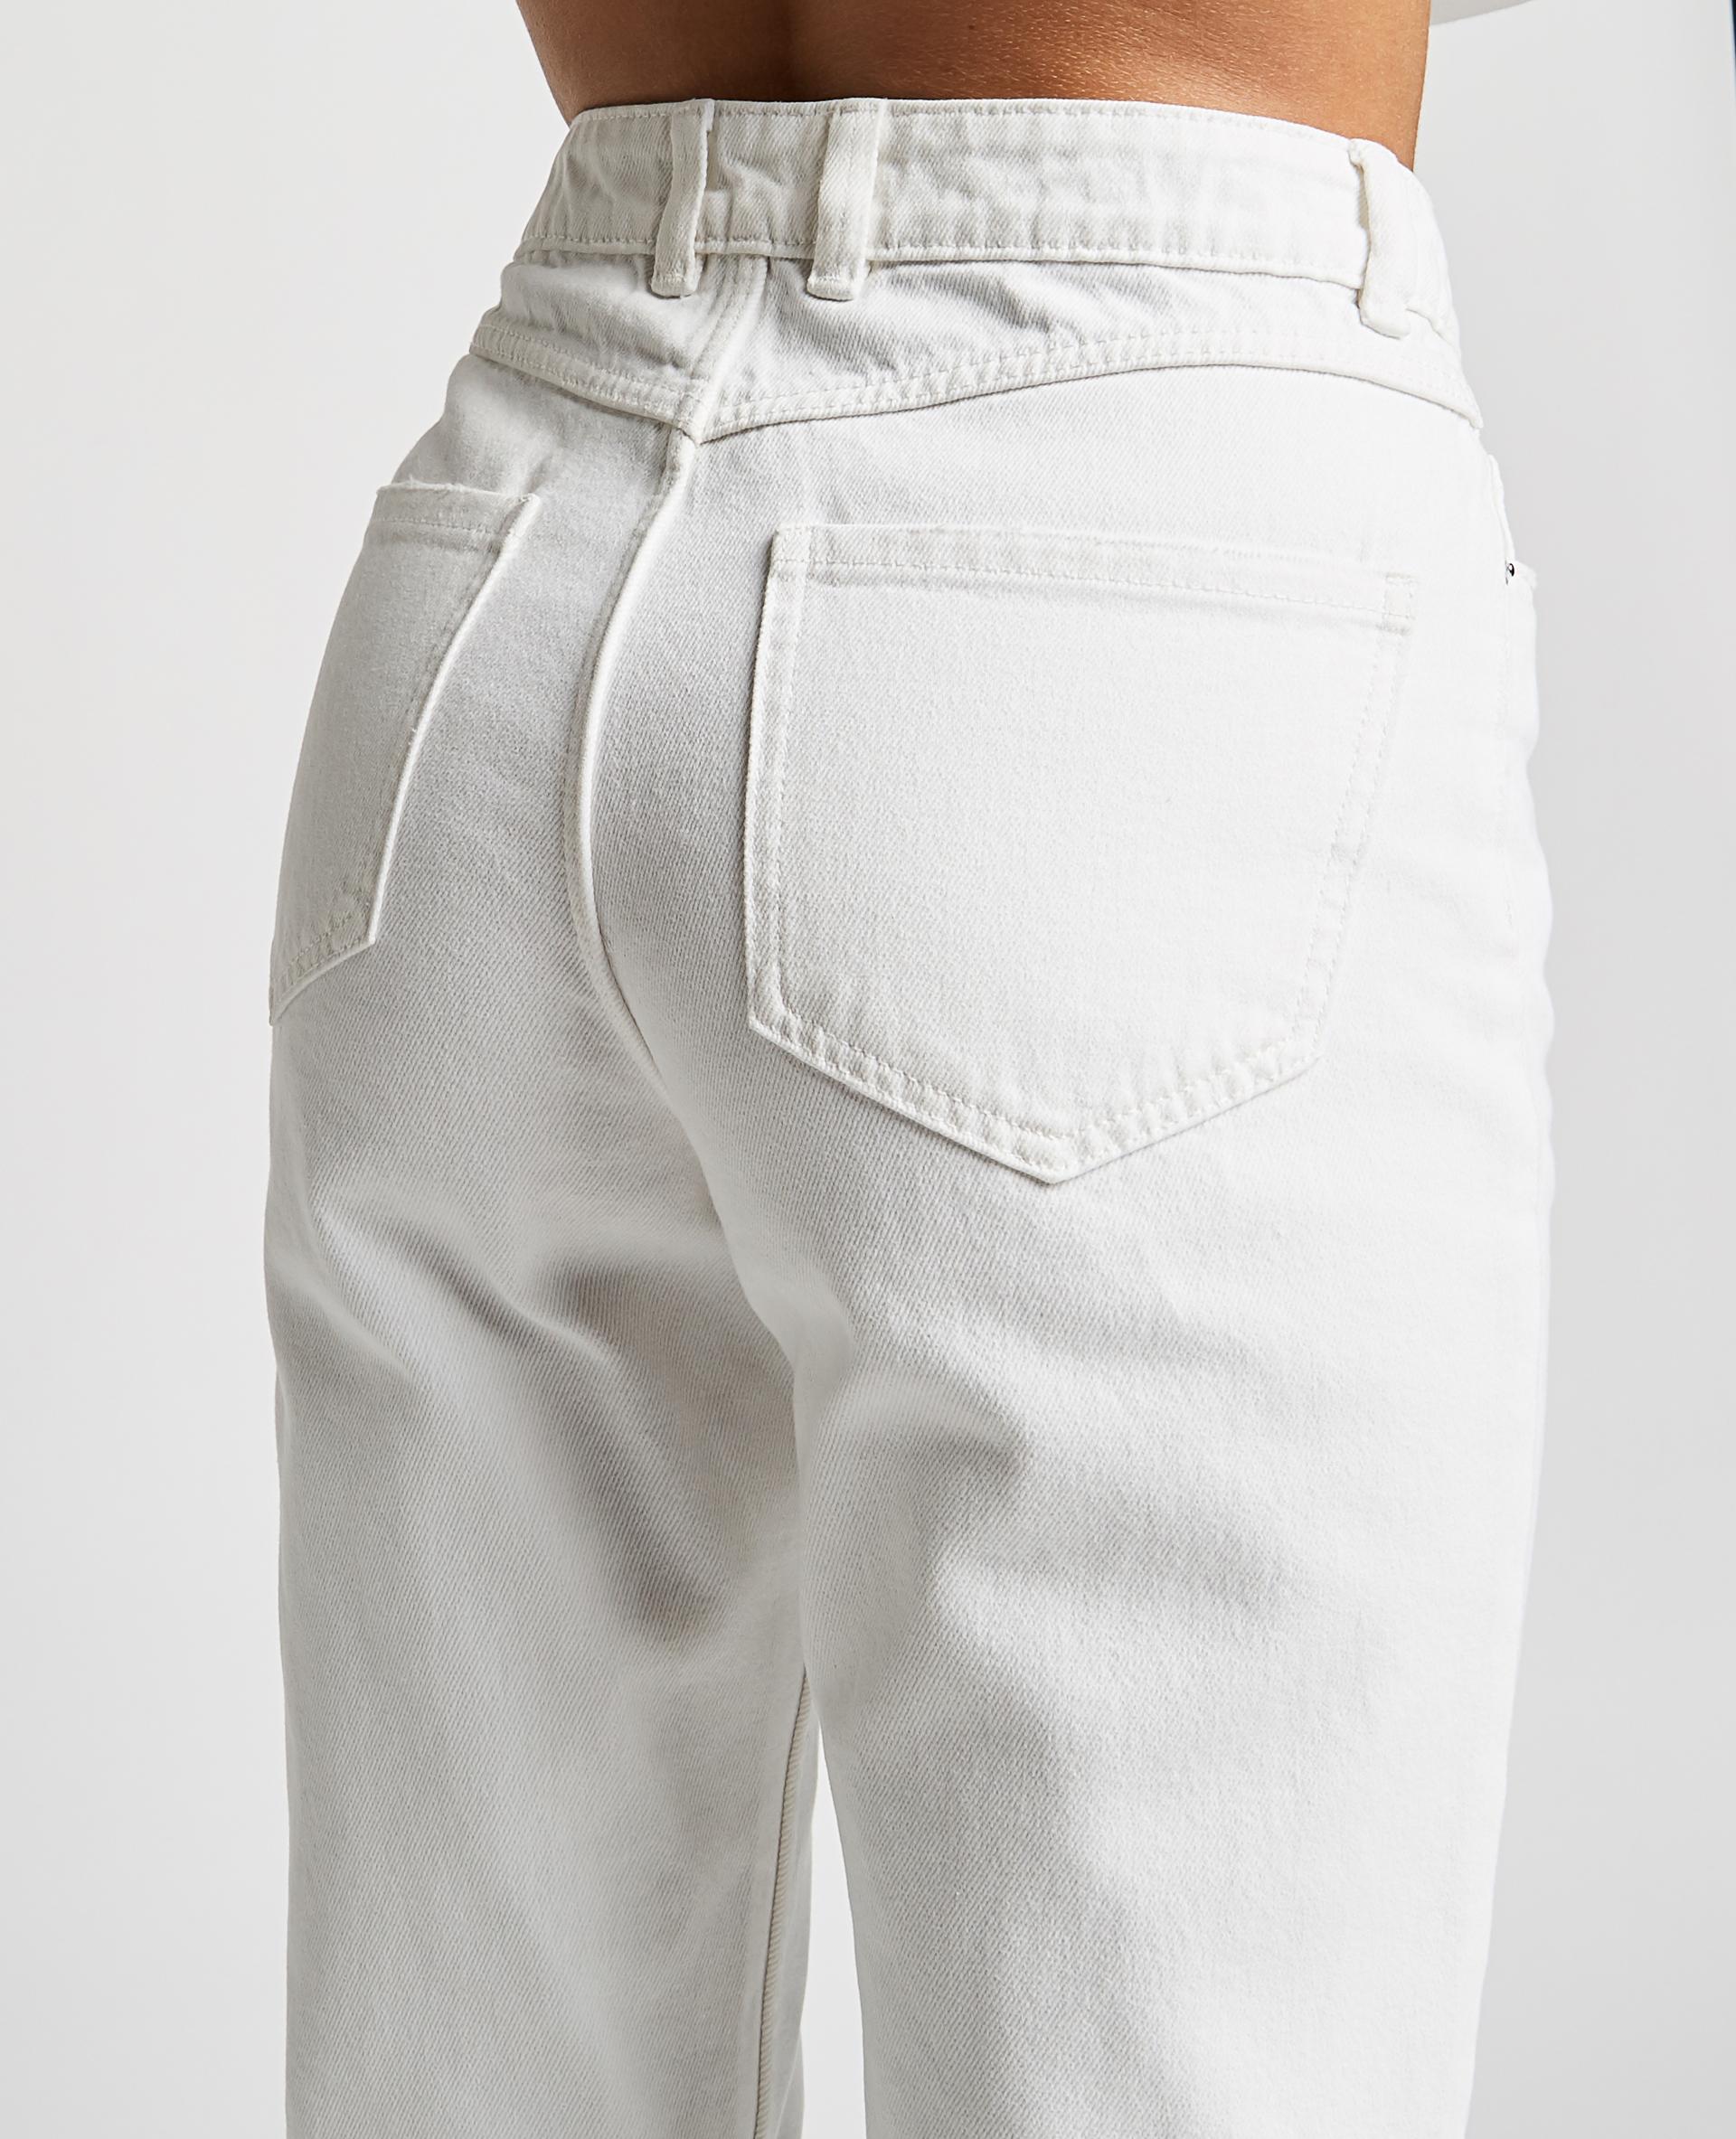 Jean taille haute blanc - Pimkie